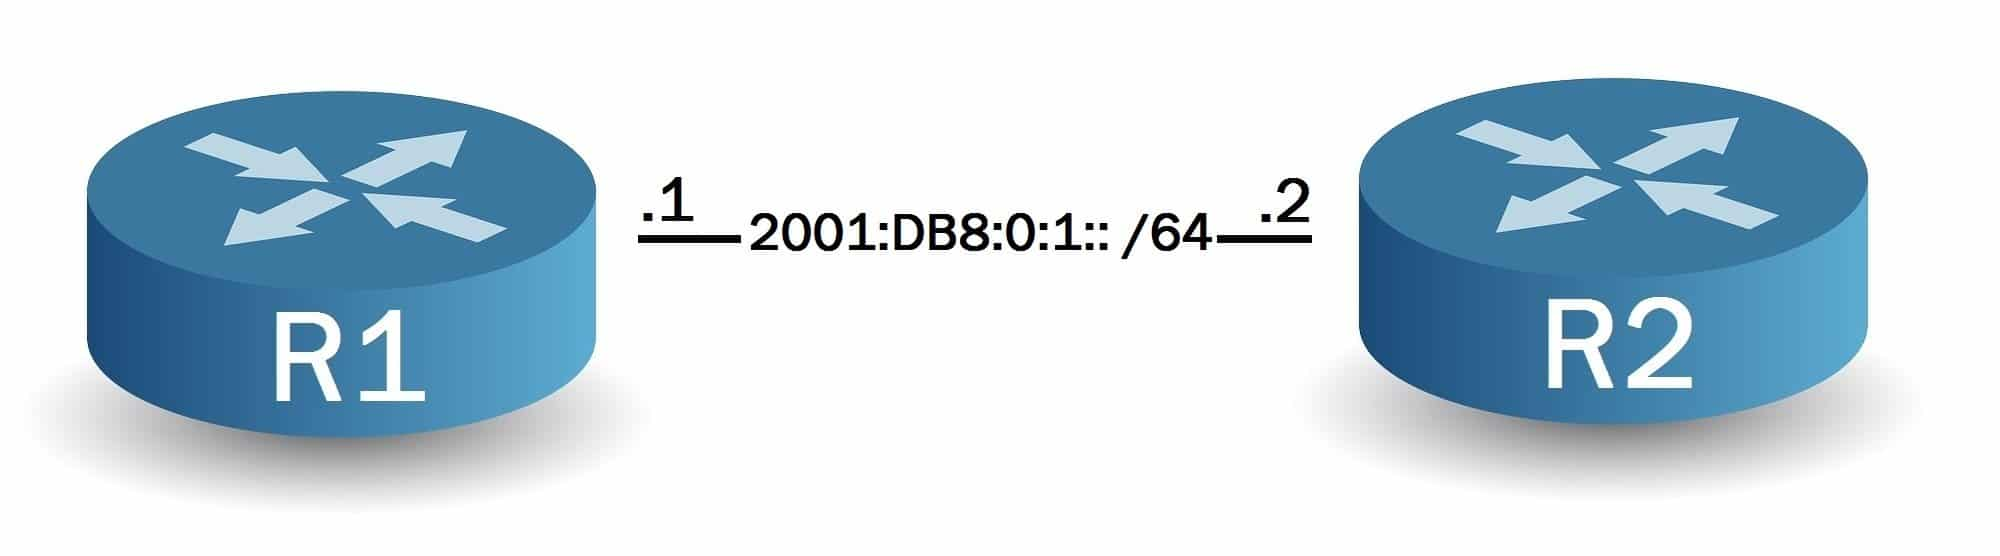 Architecture IPv6